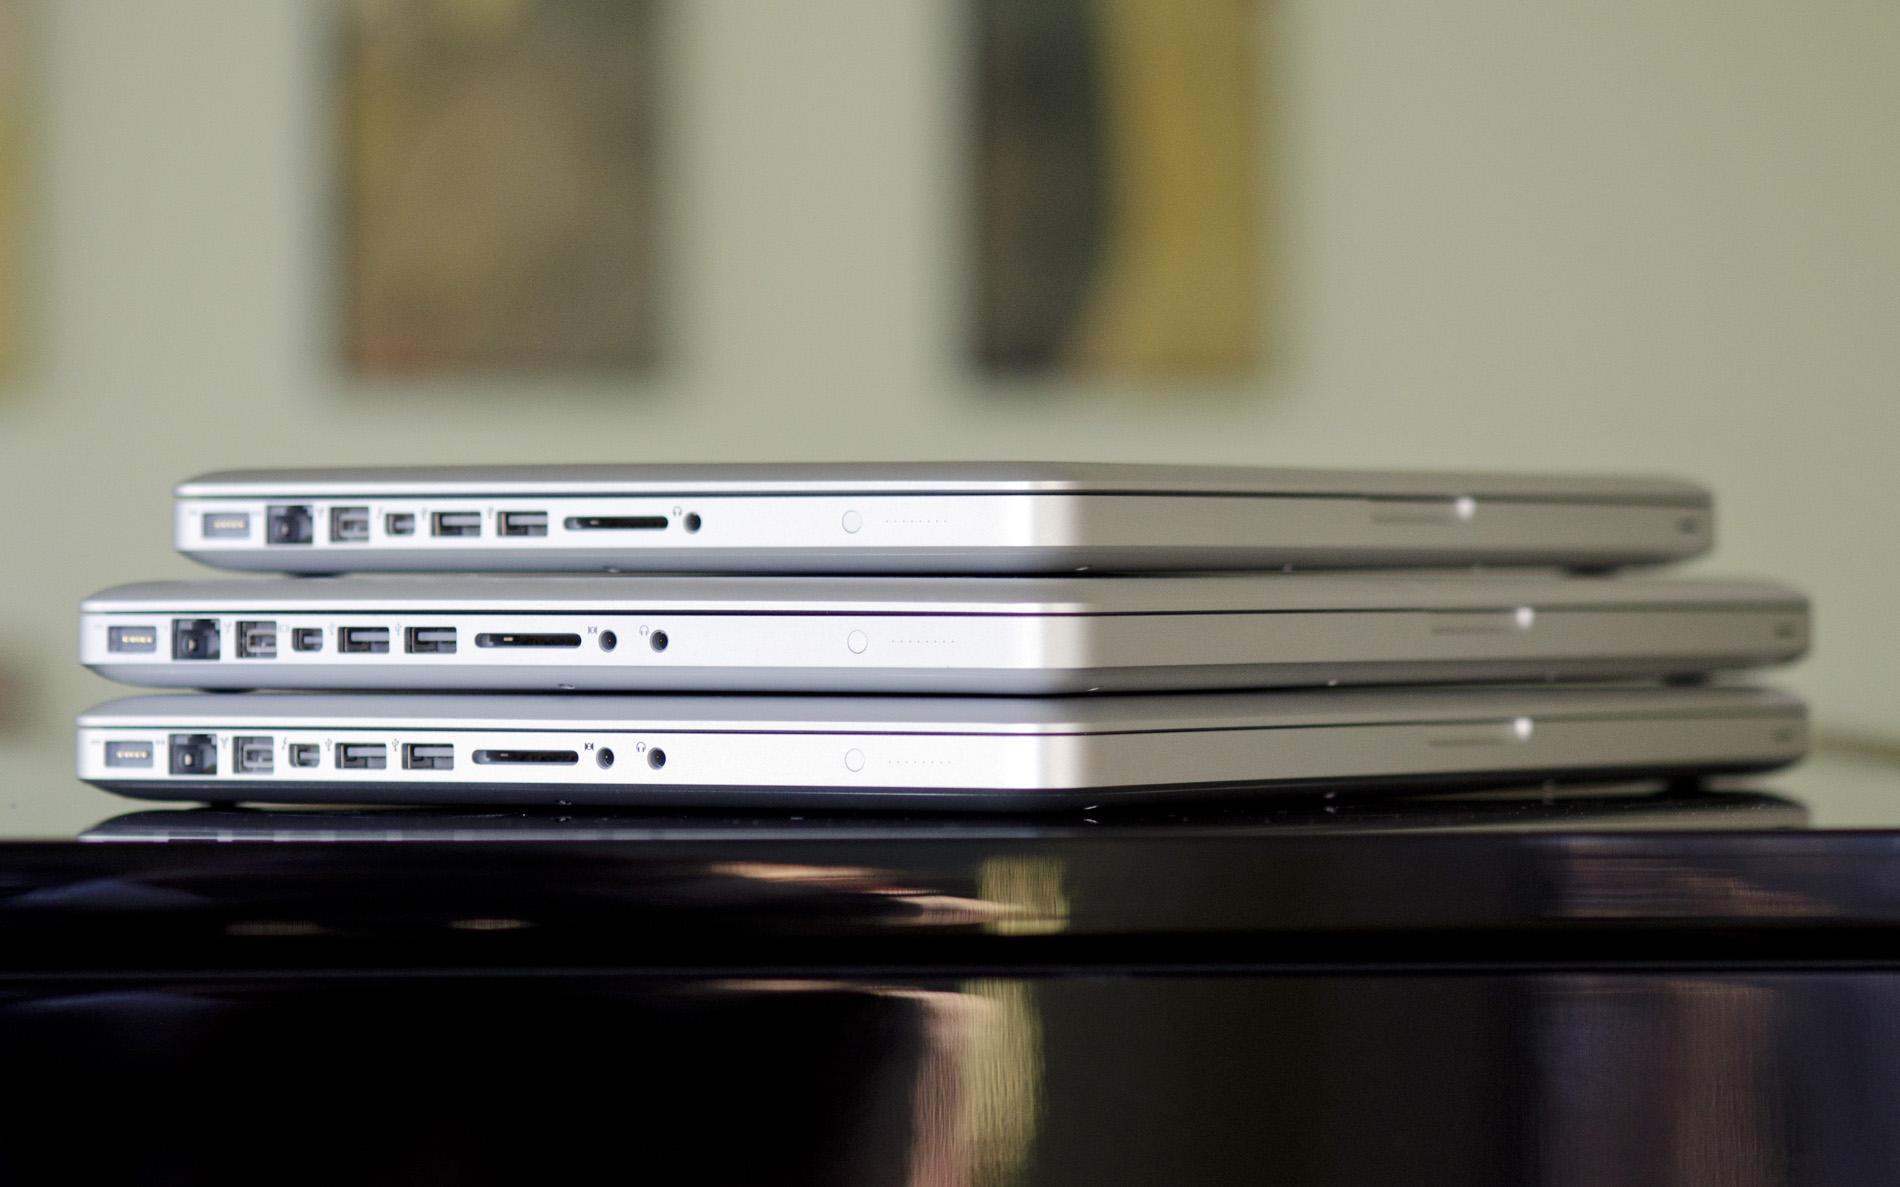 how to clean macbook pro 2017 hinge